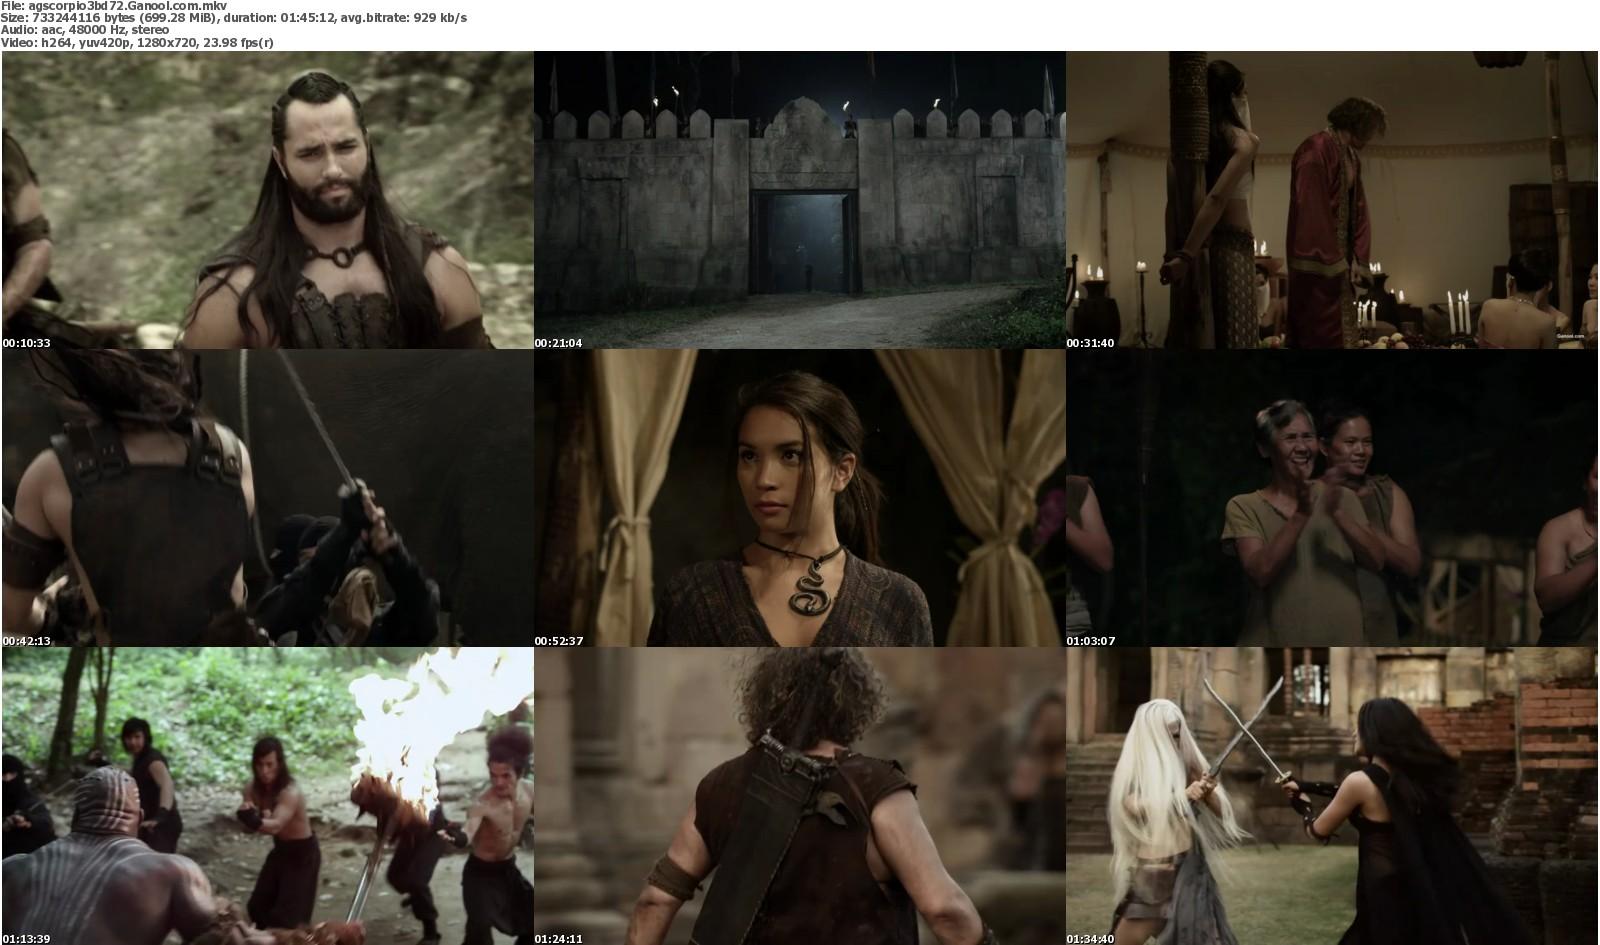 Scorpion King 3 Cast Quickmedia: The...